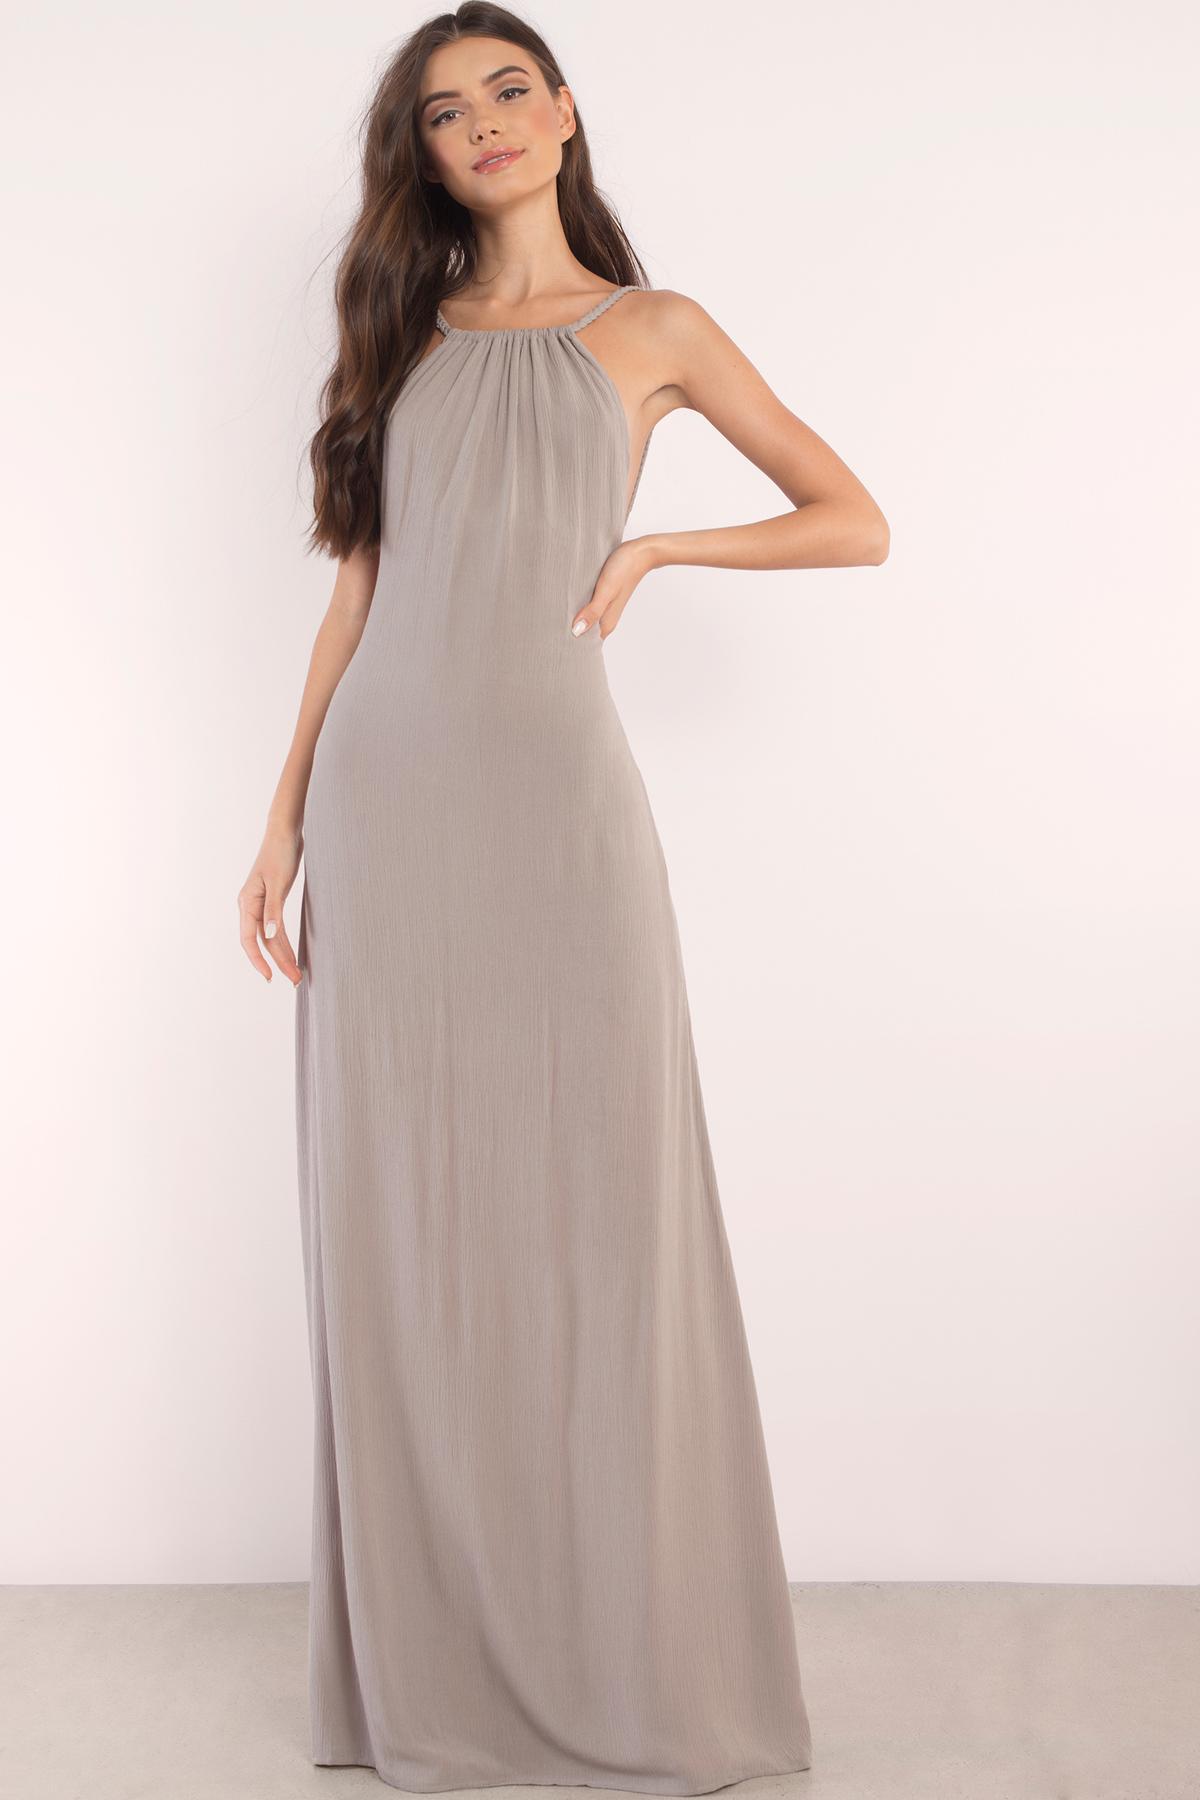 Cute Grey Maxi Dress - Backless Dress - Grey Dress - $78.00